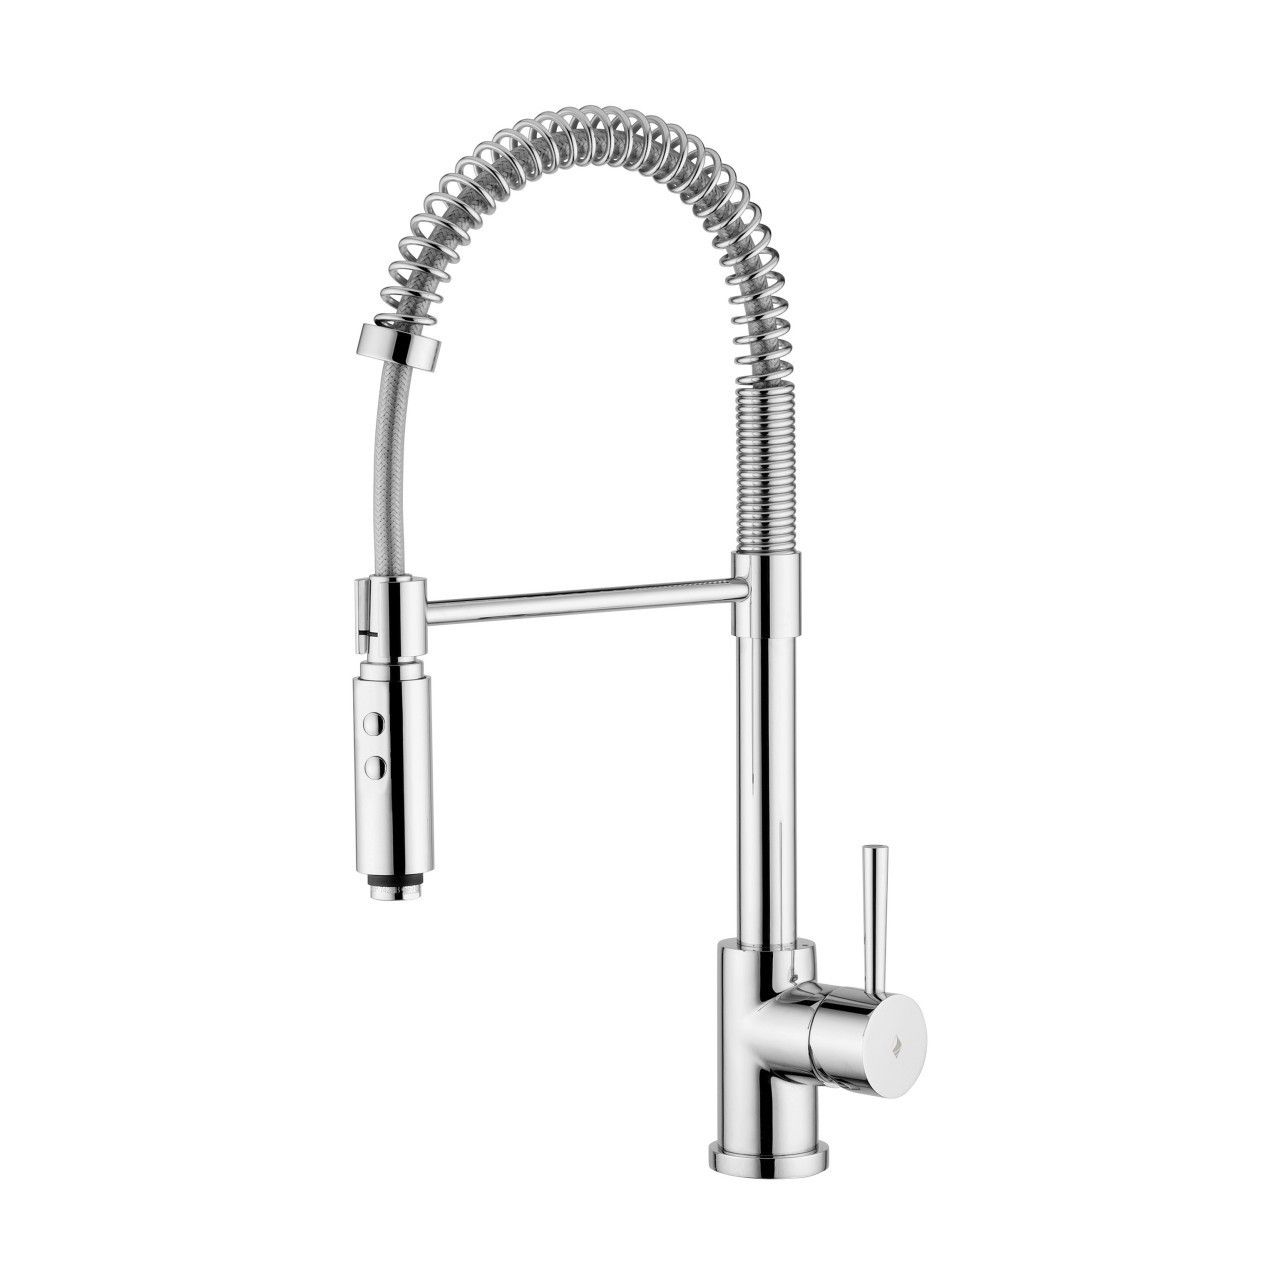 Evo 176 Kitchen Sink Faucet with Two-Spray Hand Shower | Modern ...